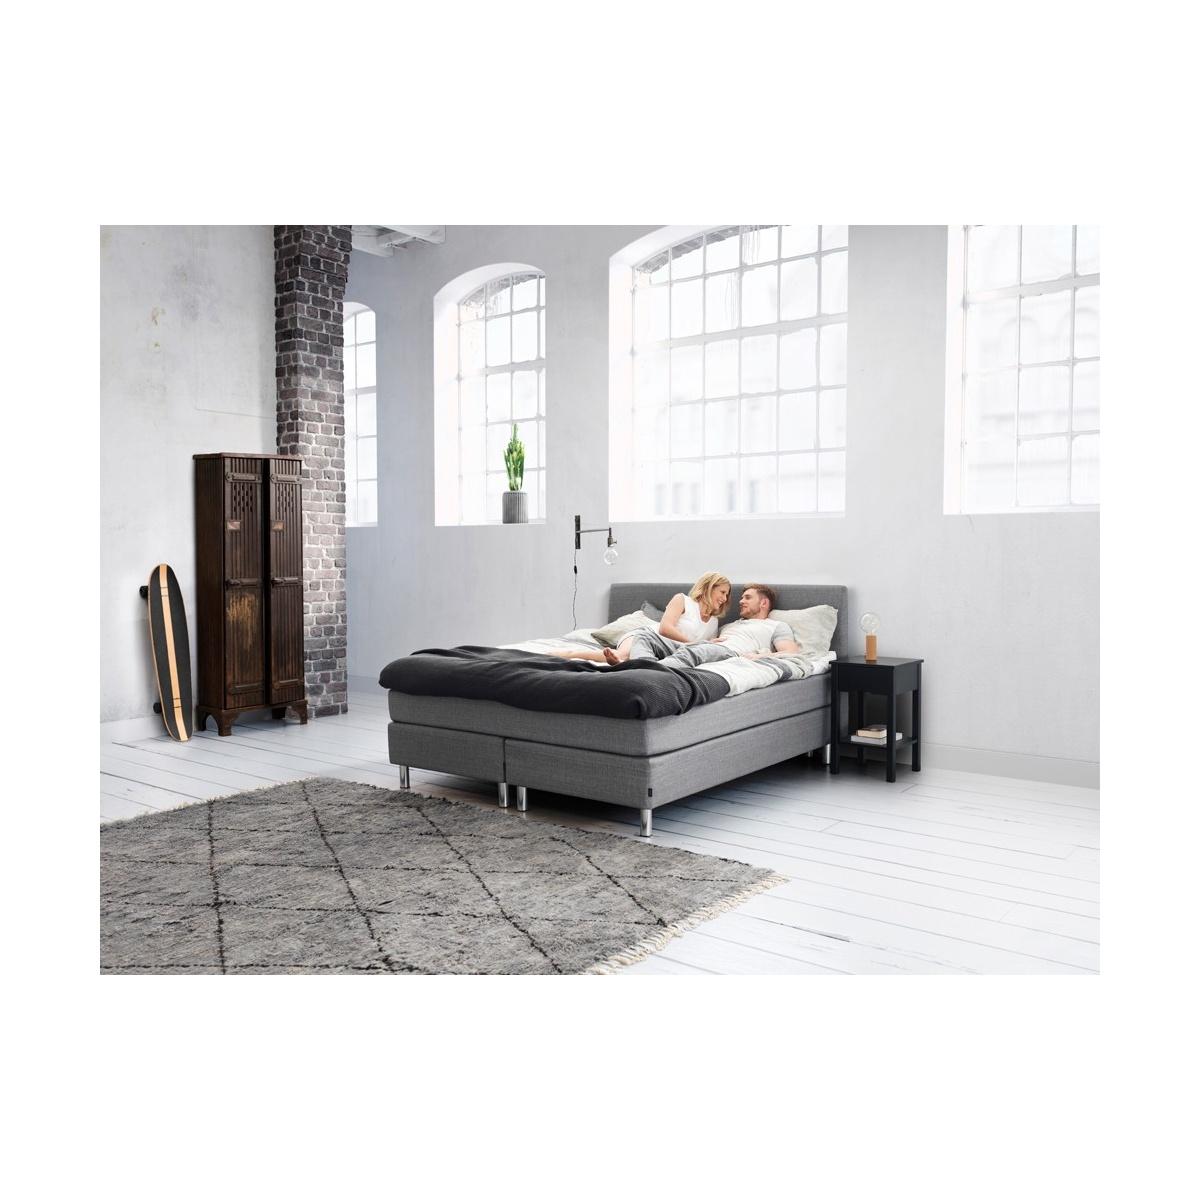 ko kontynentalne first continental jensen. Black Bedroom Furniture Sets. Home Design Ideas